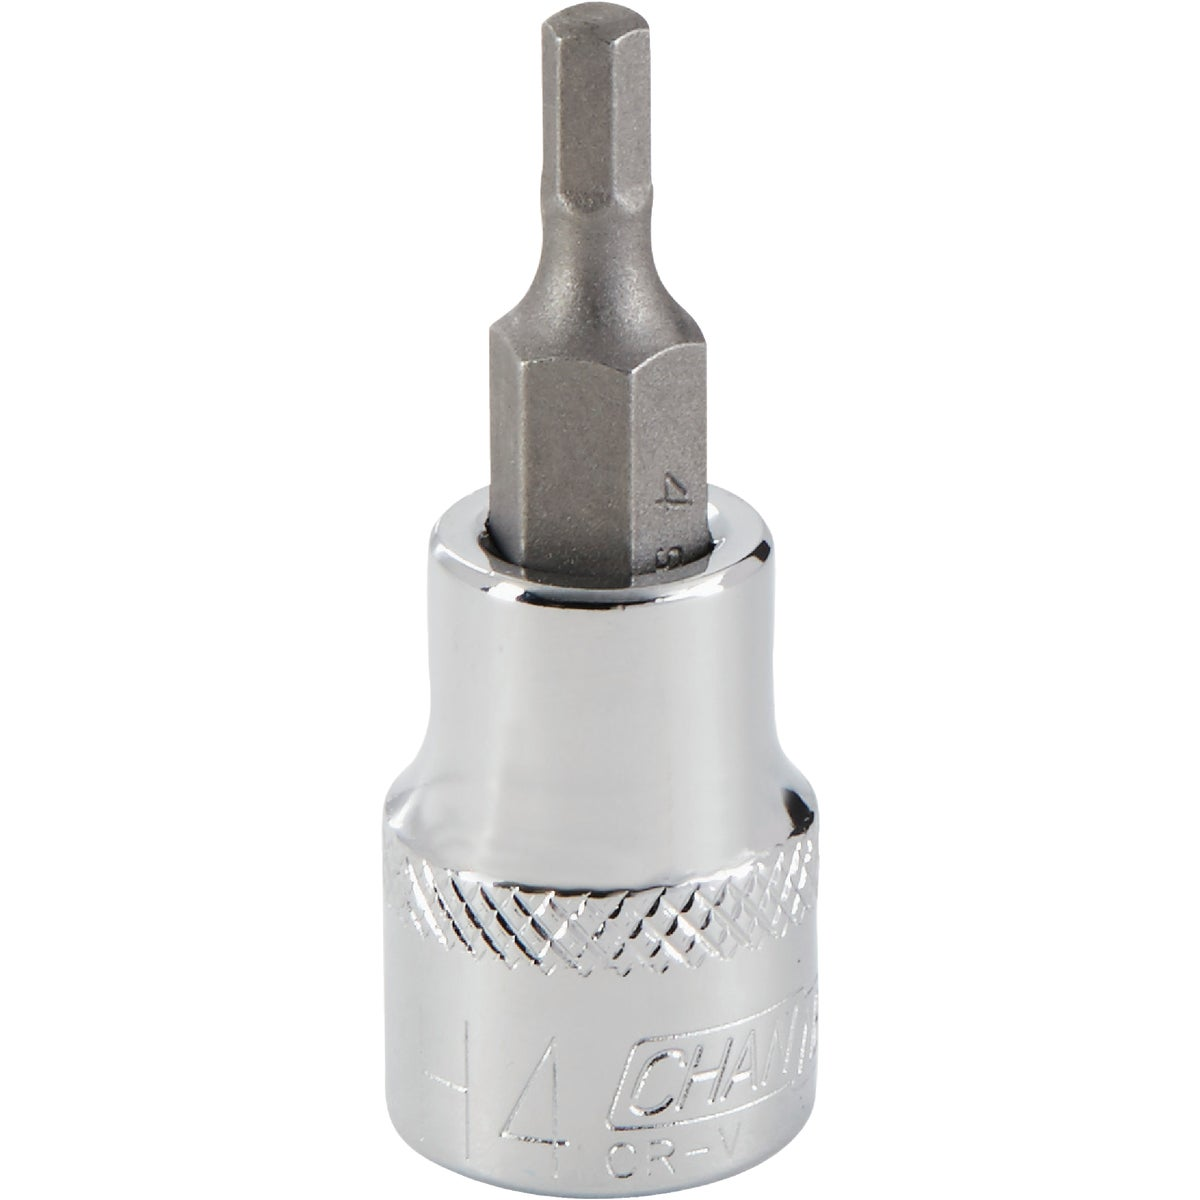 Best Way Tools 4MM HEX BIT SOCKET 372250